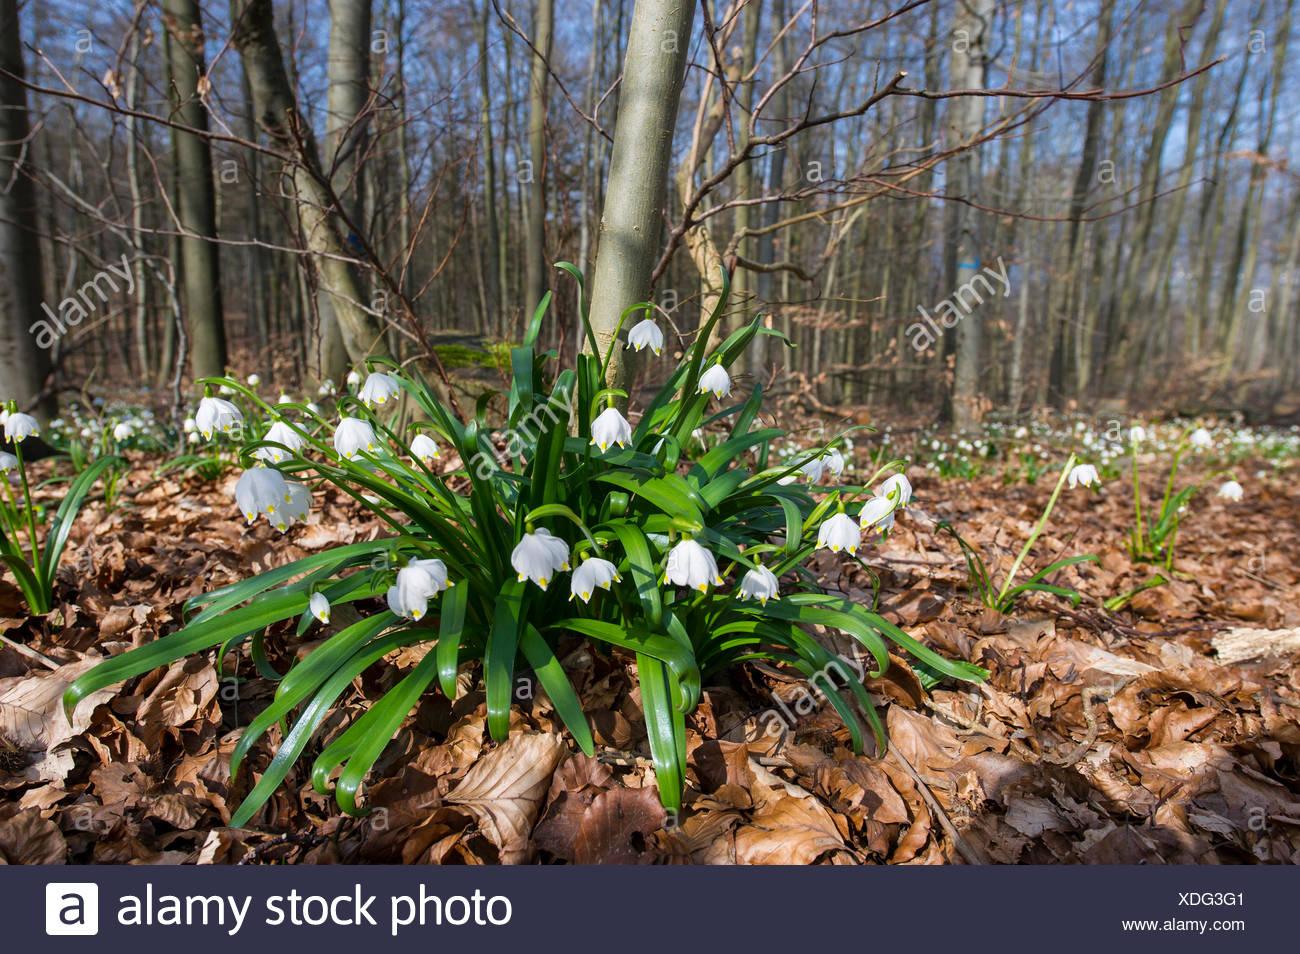 spring snowflake (Leucojum vernum), wild plants blooming, Germany - Stock Image